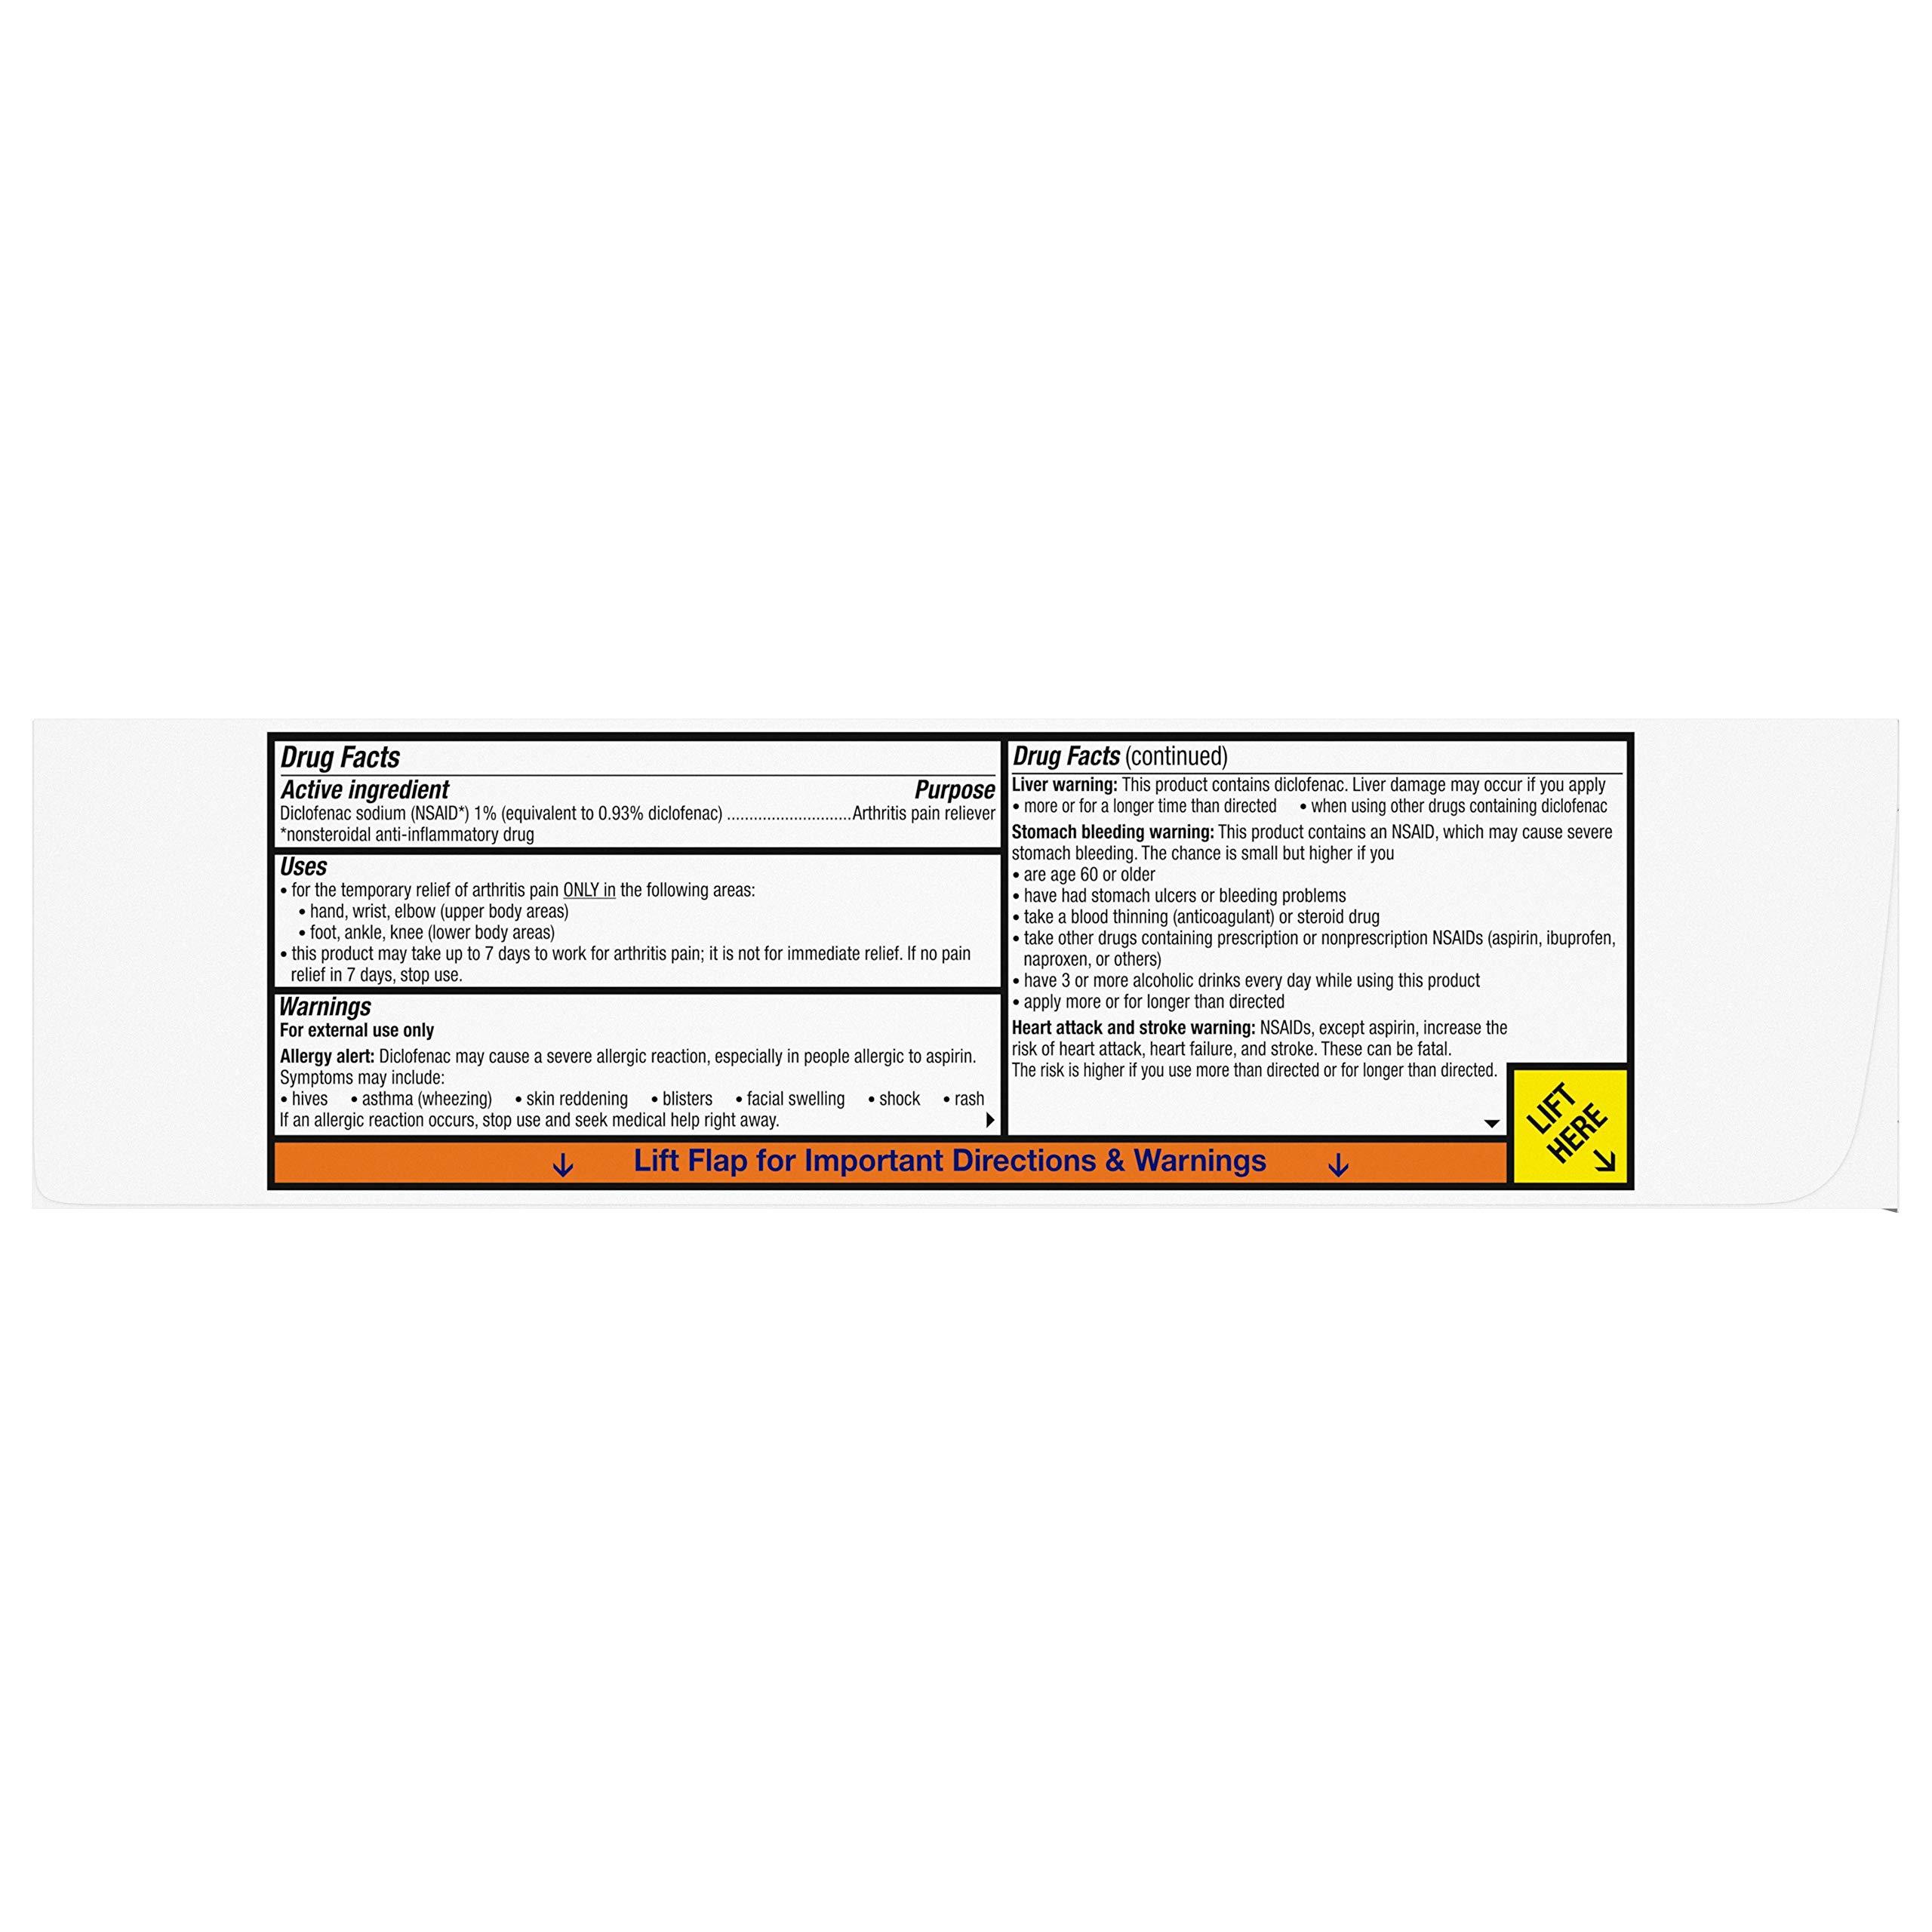 Voltaren Topical Arthritis Pain Relief Gel - 5.29 Ounce Tube (Pack of 2), 5.29 Ounce